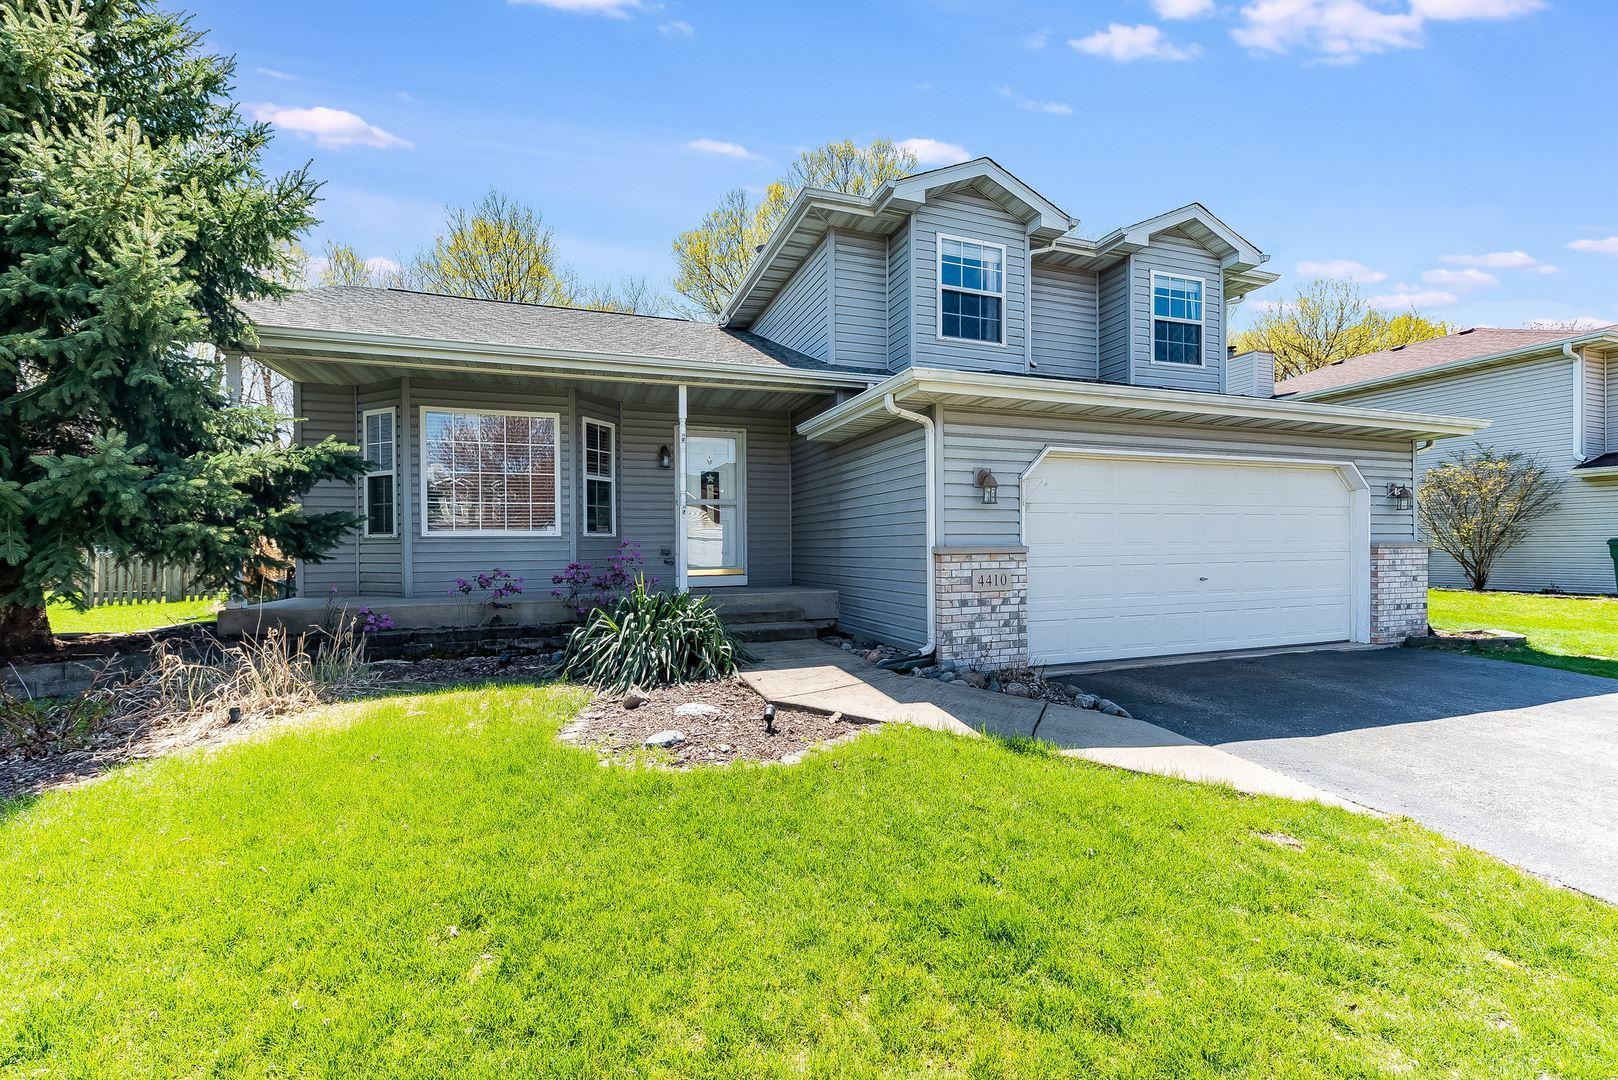 Photo of 4410 Willowbend Drive, Plainfield, IL 60586 (MLS # 11056568)